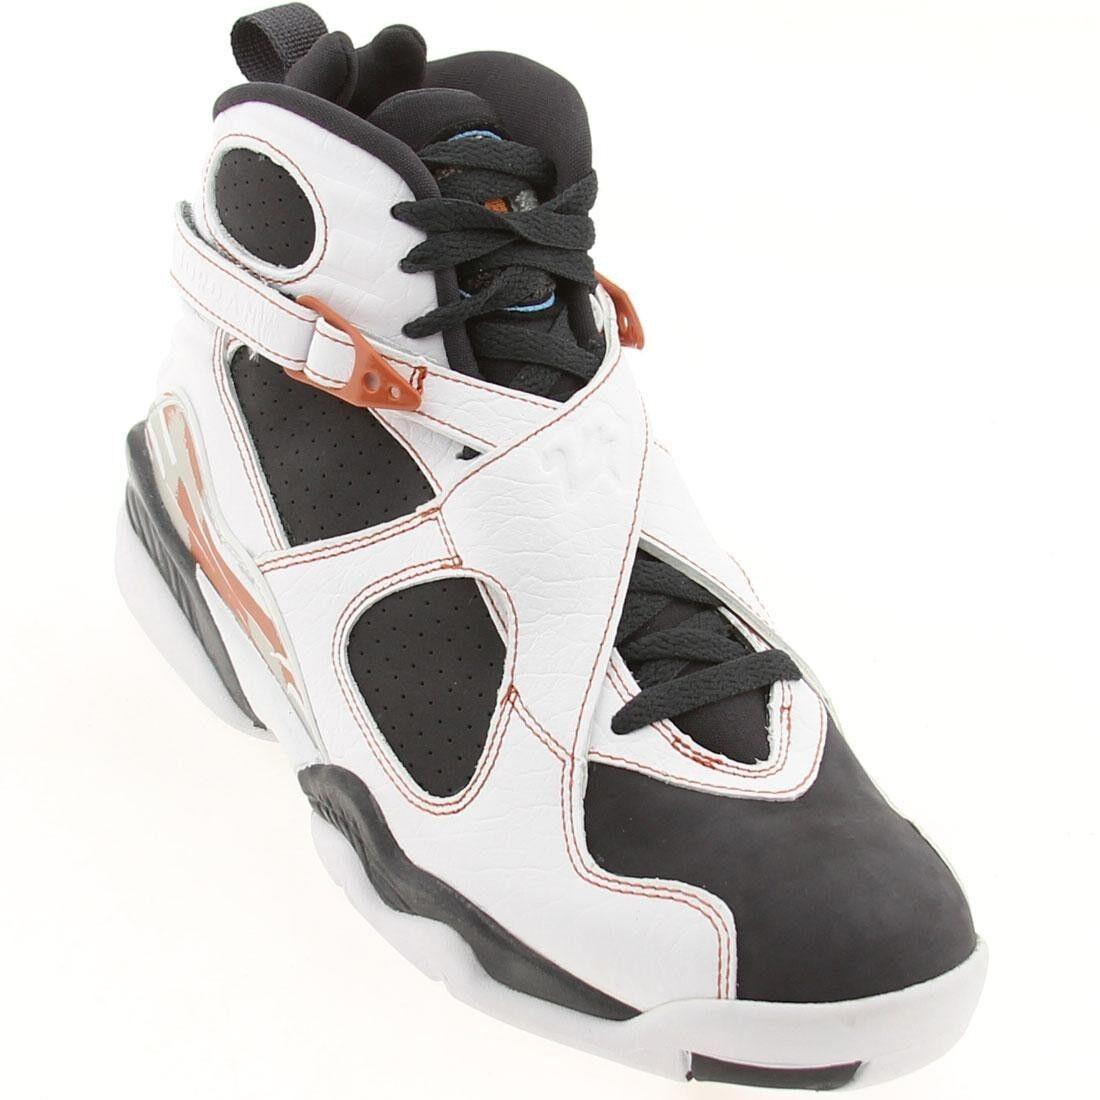 317258-104 New Men Nike Air Jordan Retro 8 VIII LS white